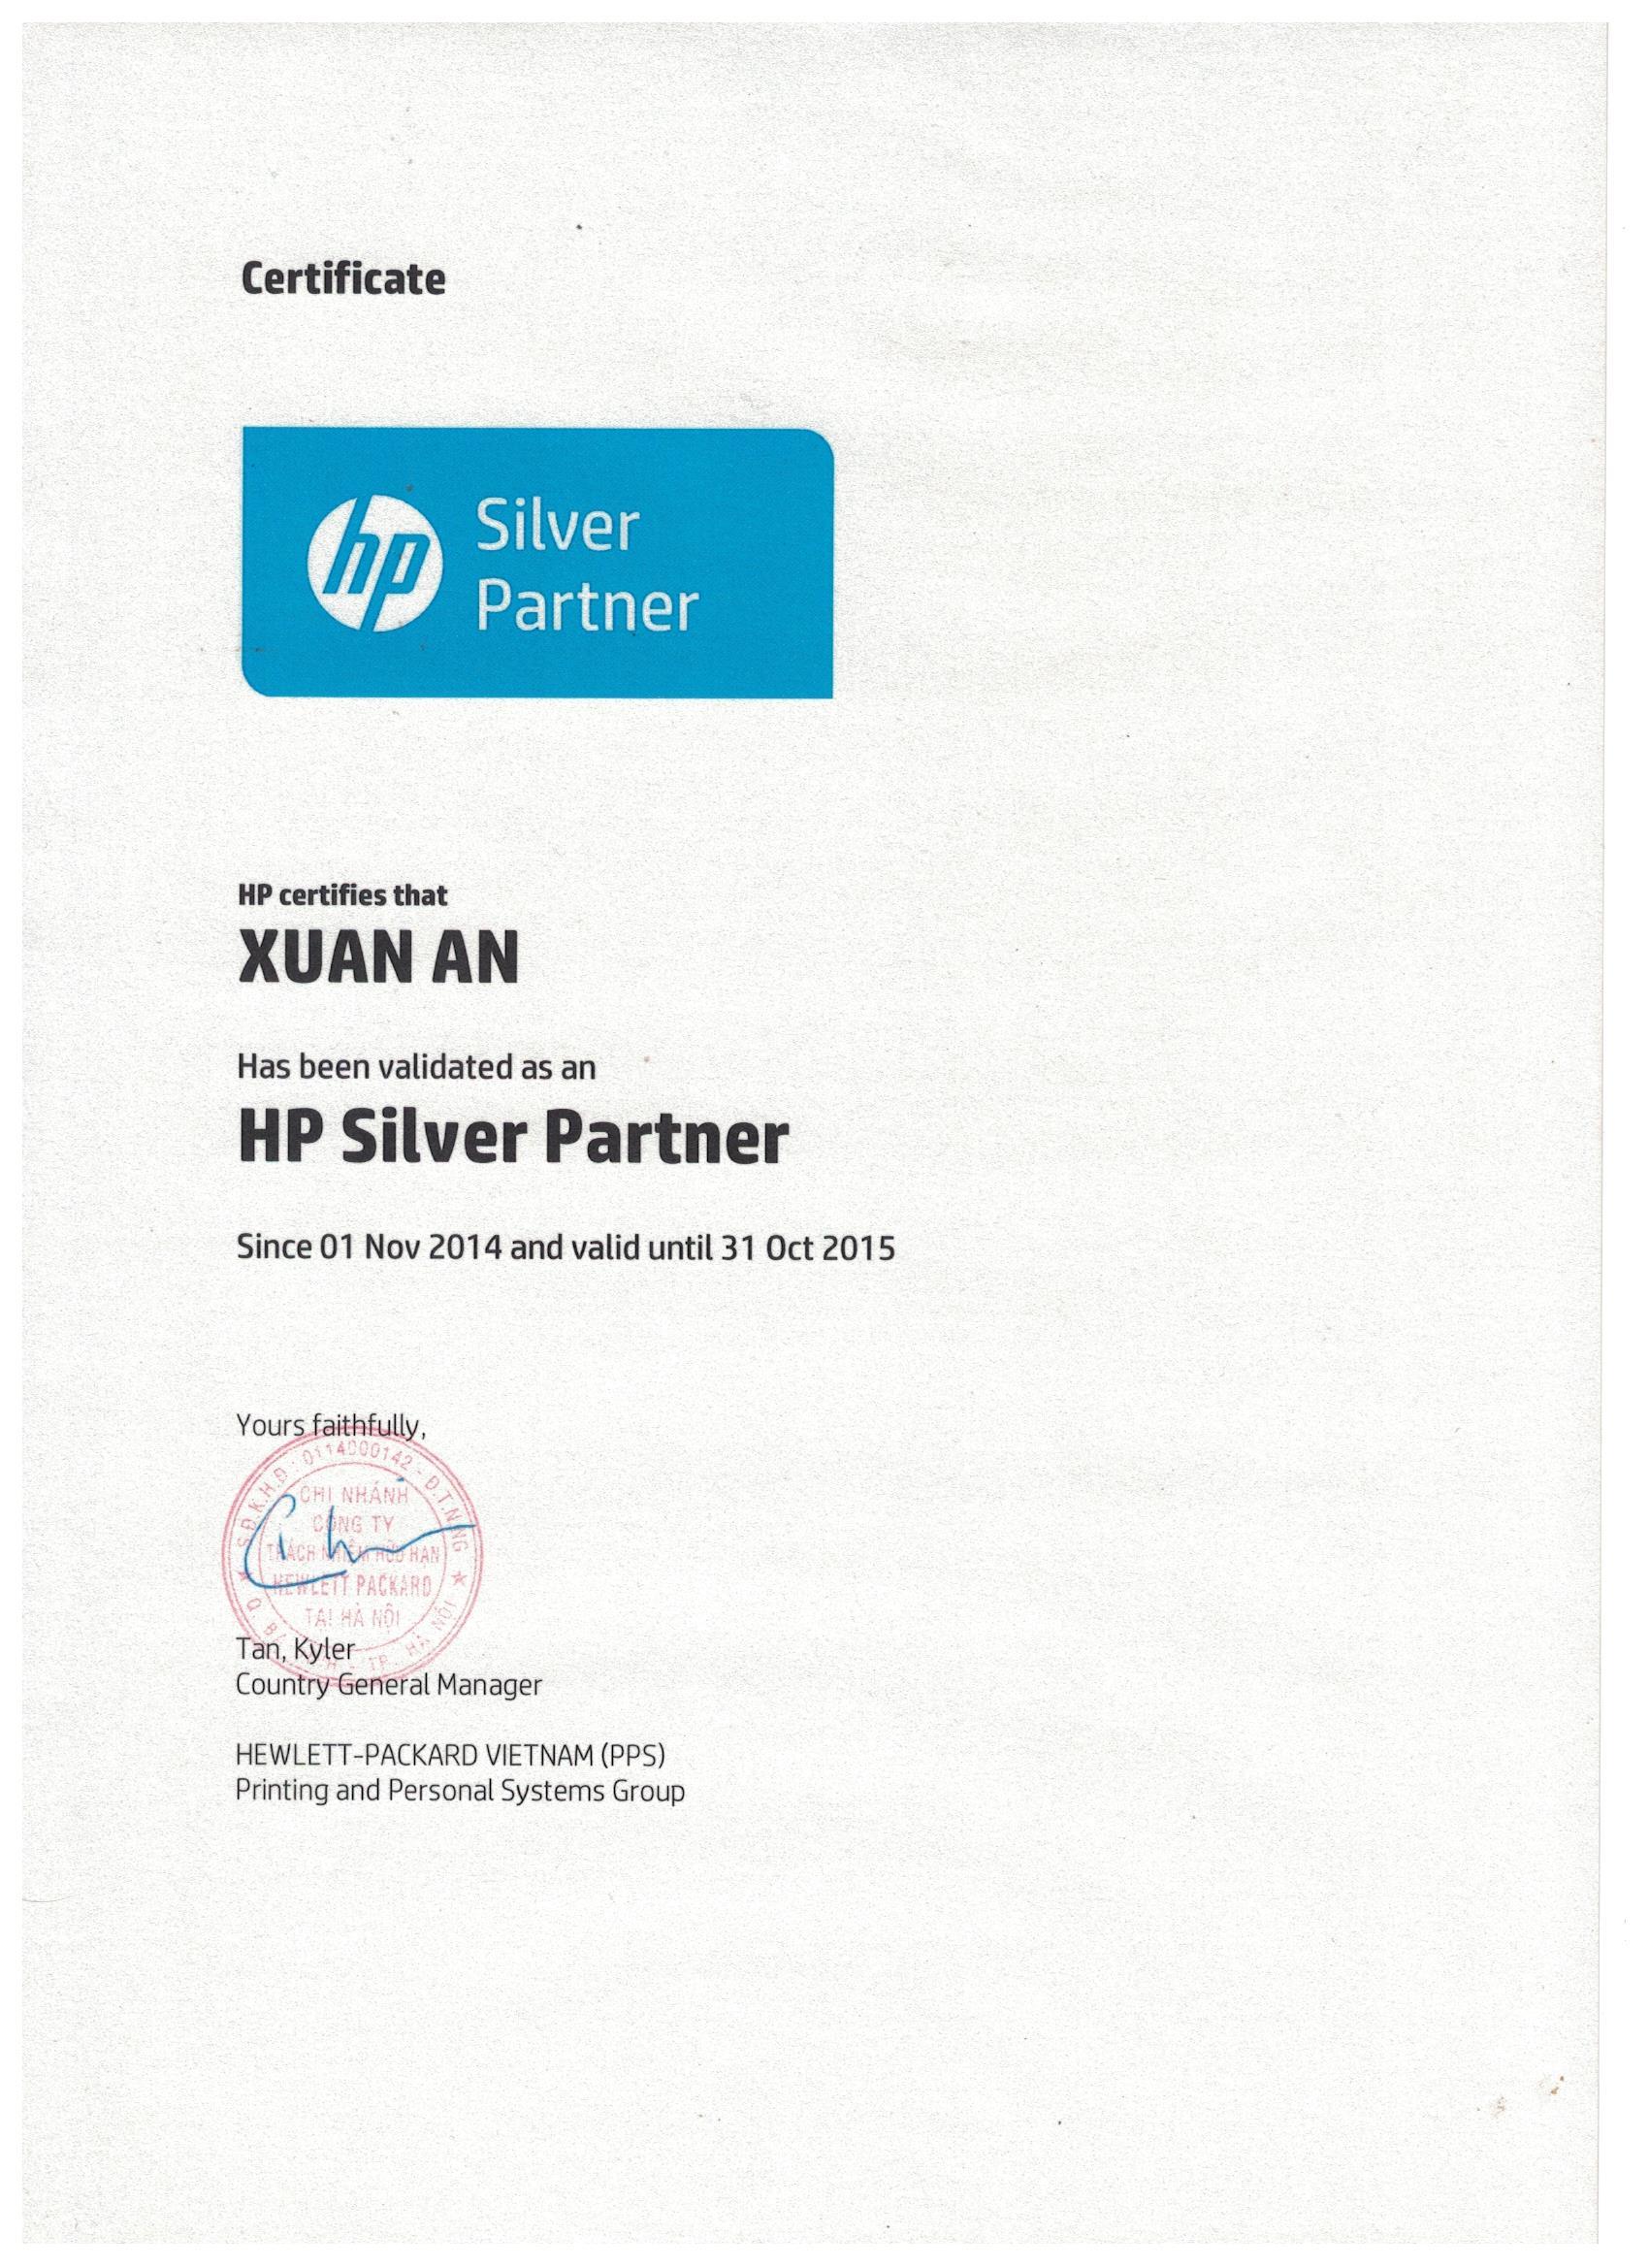 HP Probook 430 G7 - 9GQ08PA (Silver)